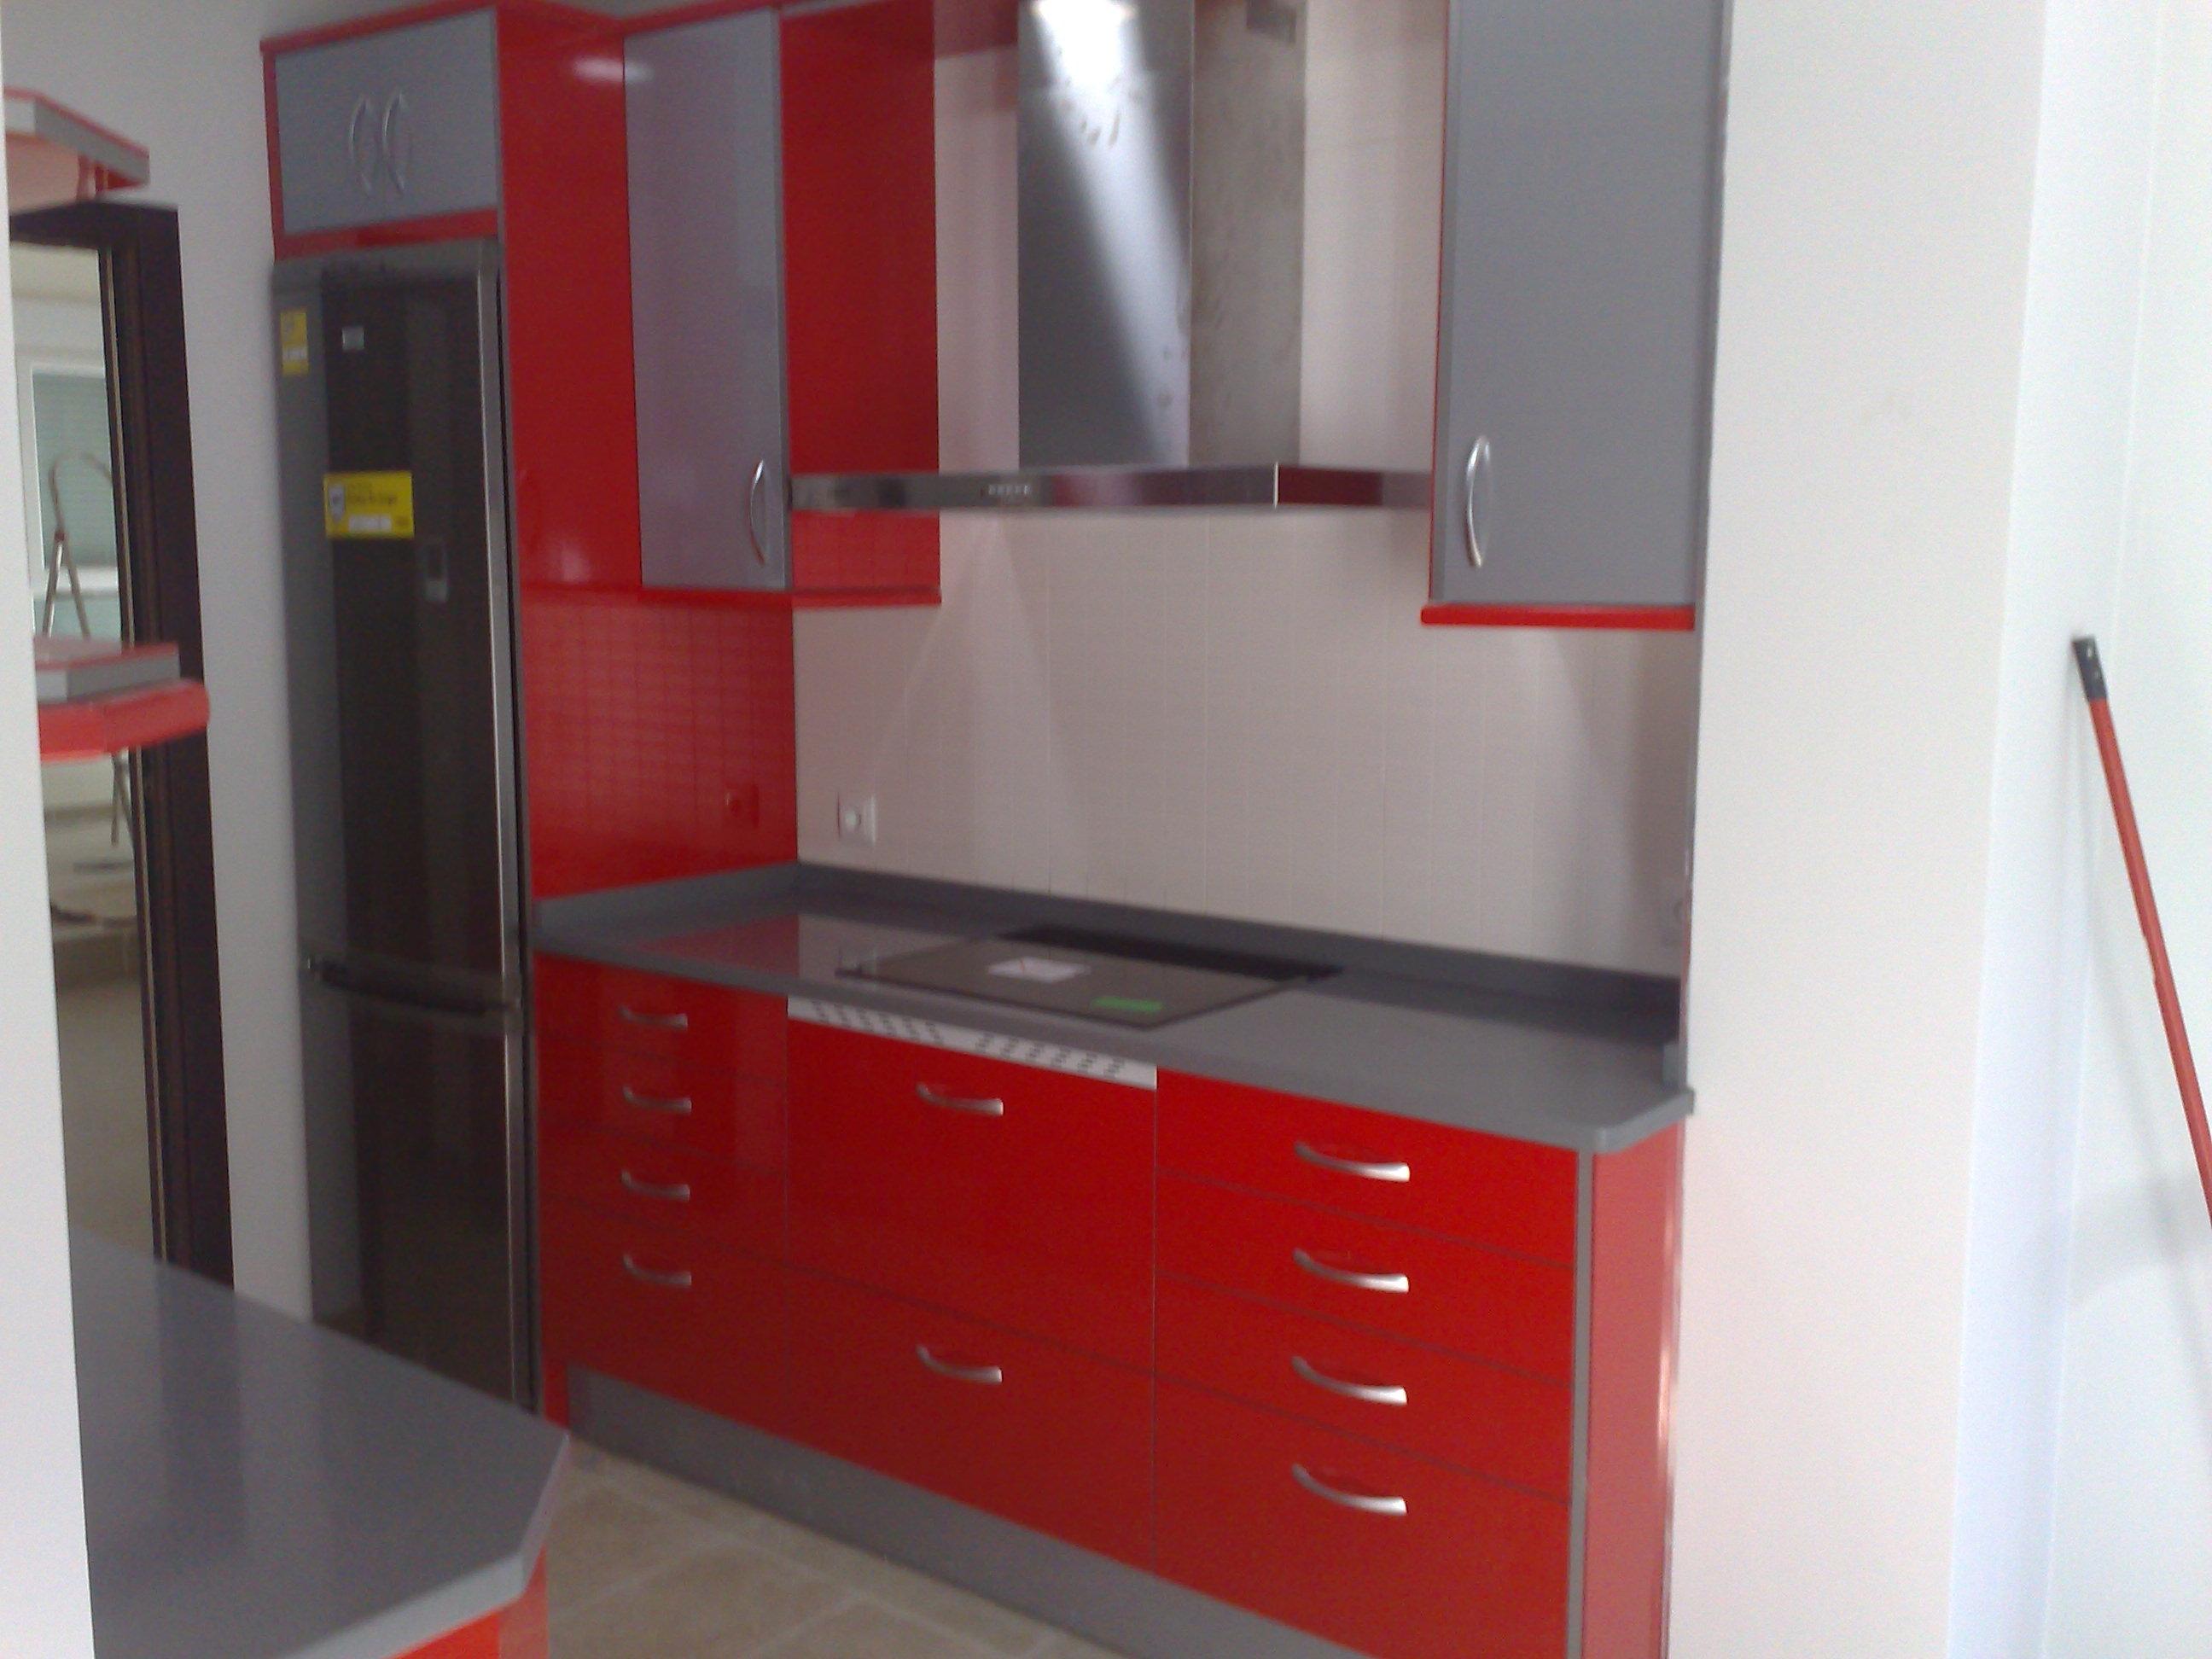 Muebles valdecocina muebles de cocina for Muebles de cocina sims 4